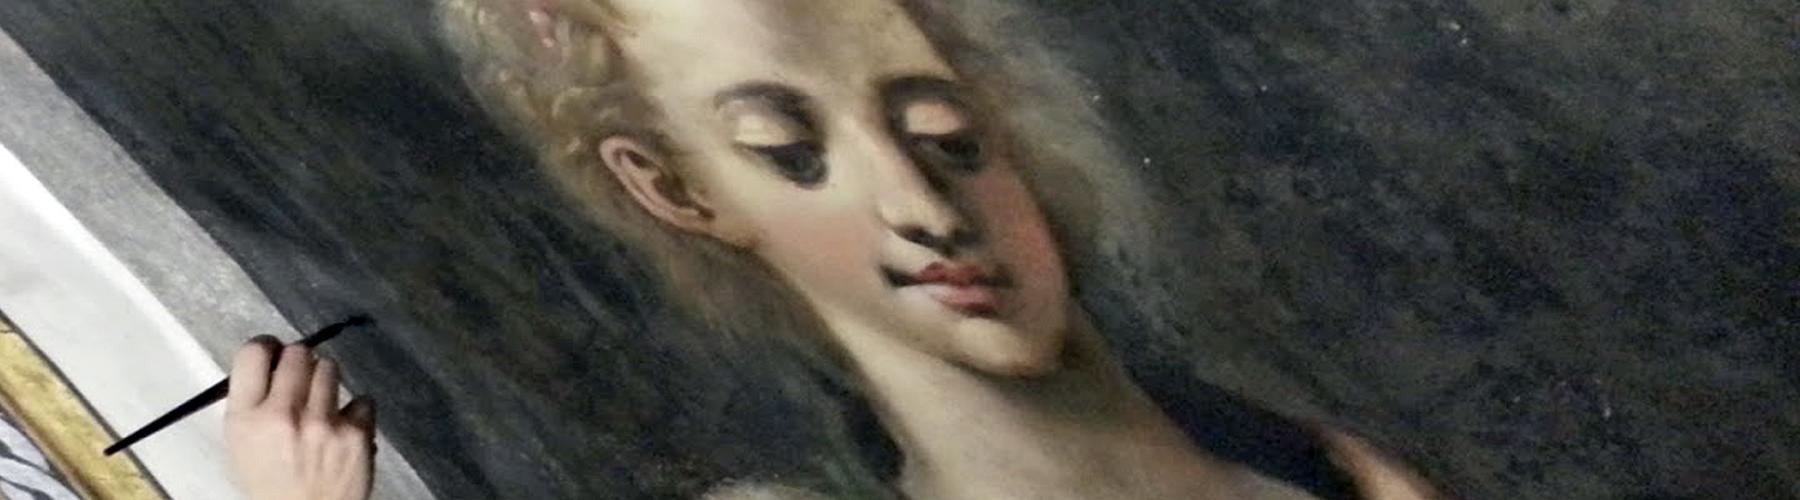 restauration peinture murale normandie